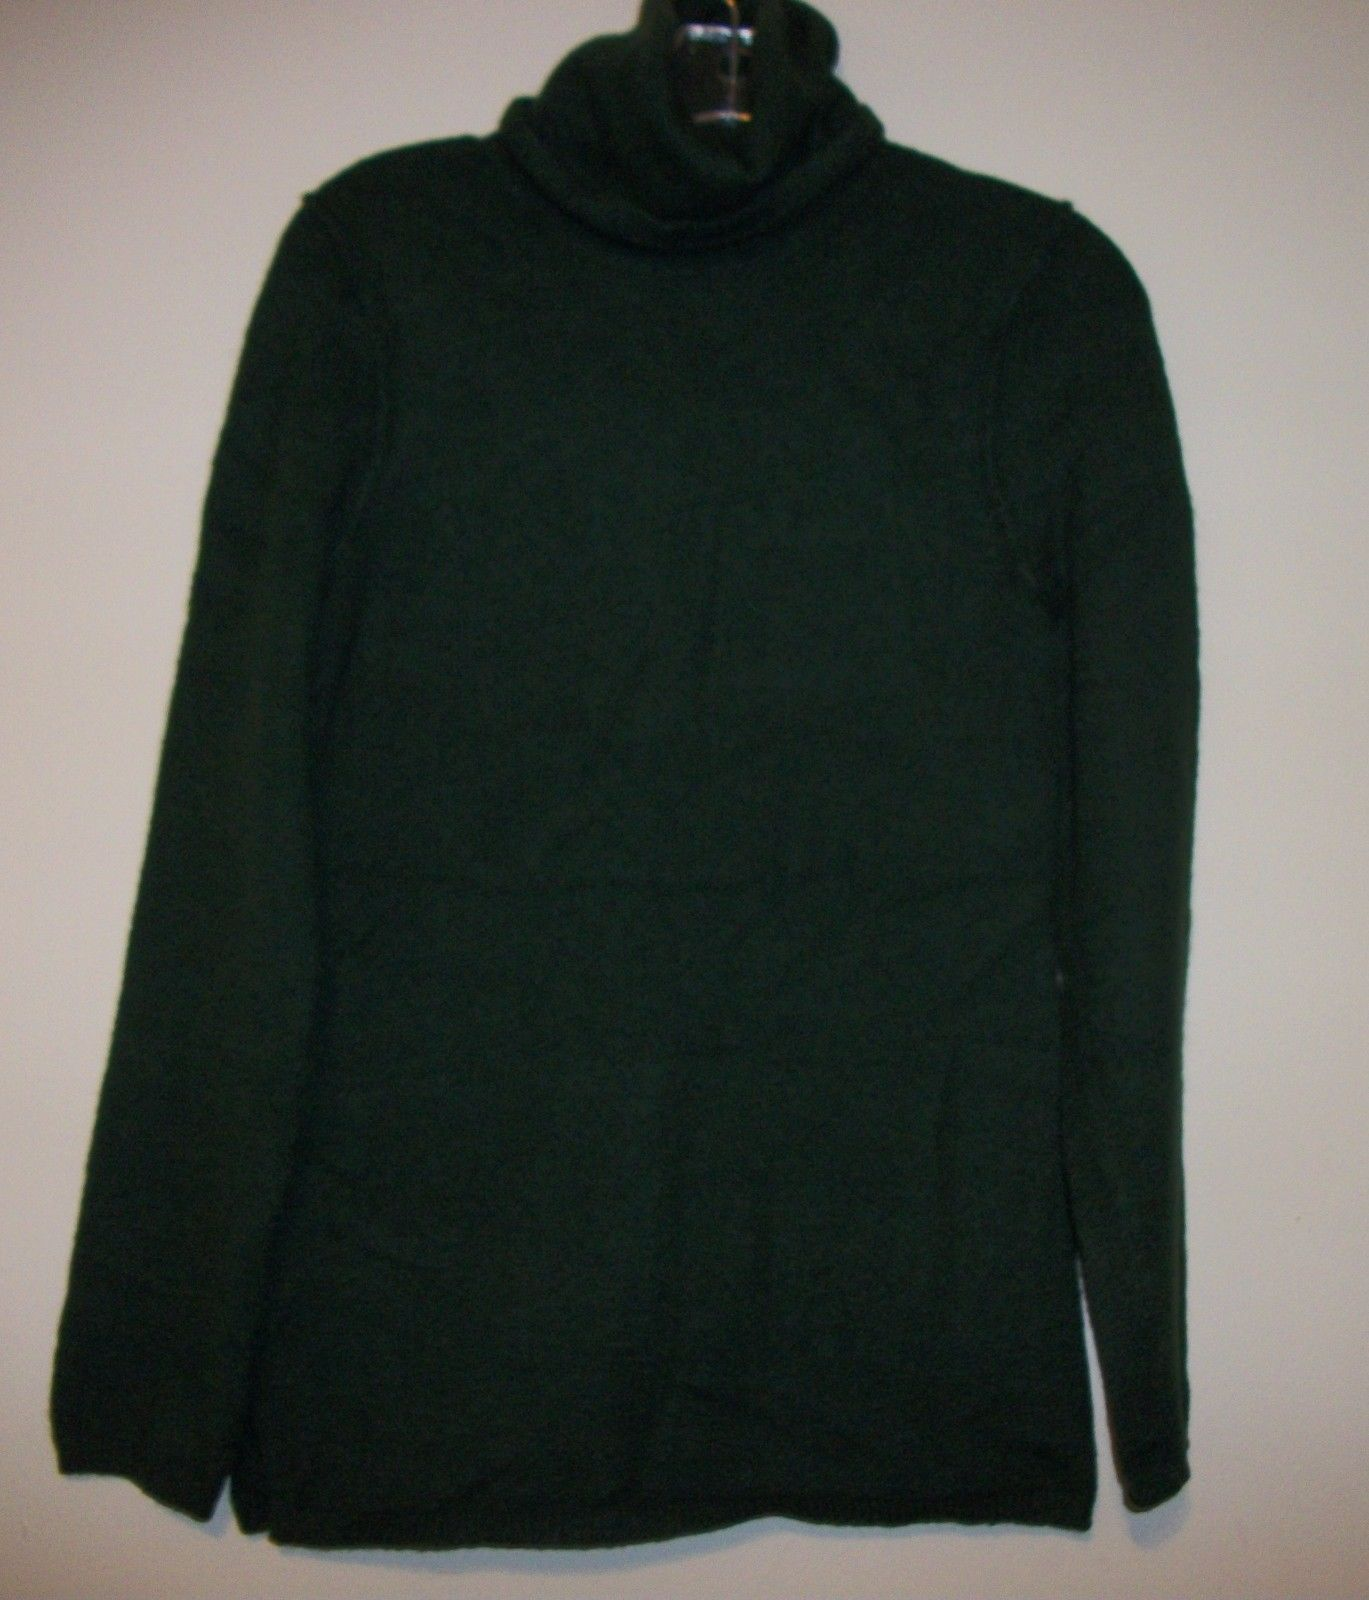 Gap Womens Turtleneck Boucle Sweater Tunic, green, size M